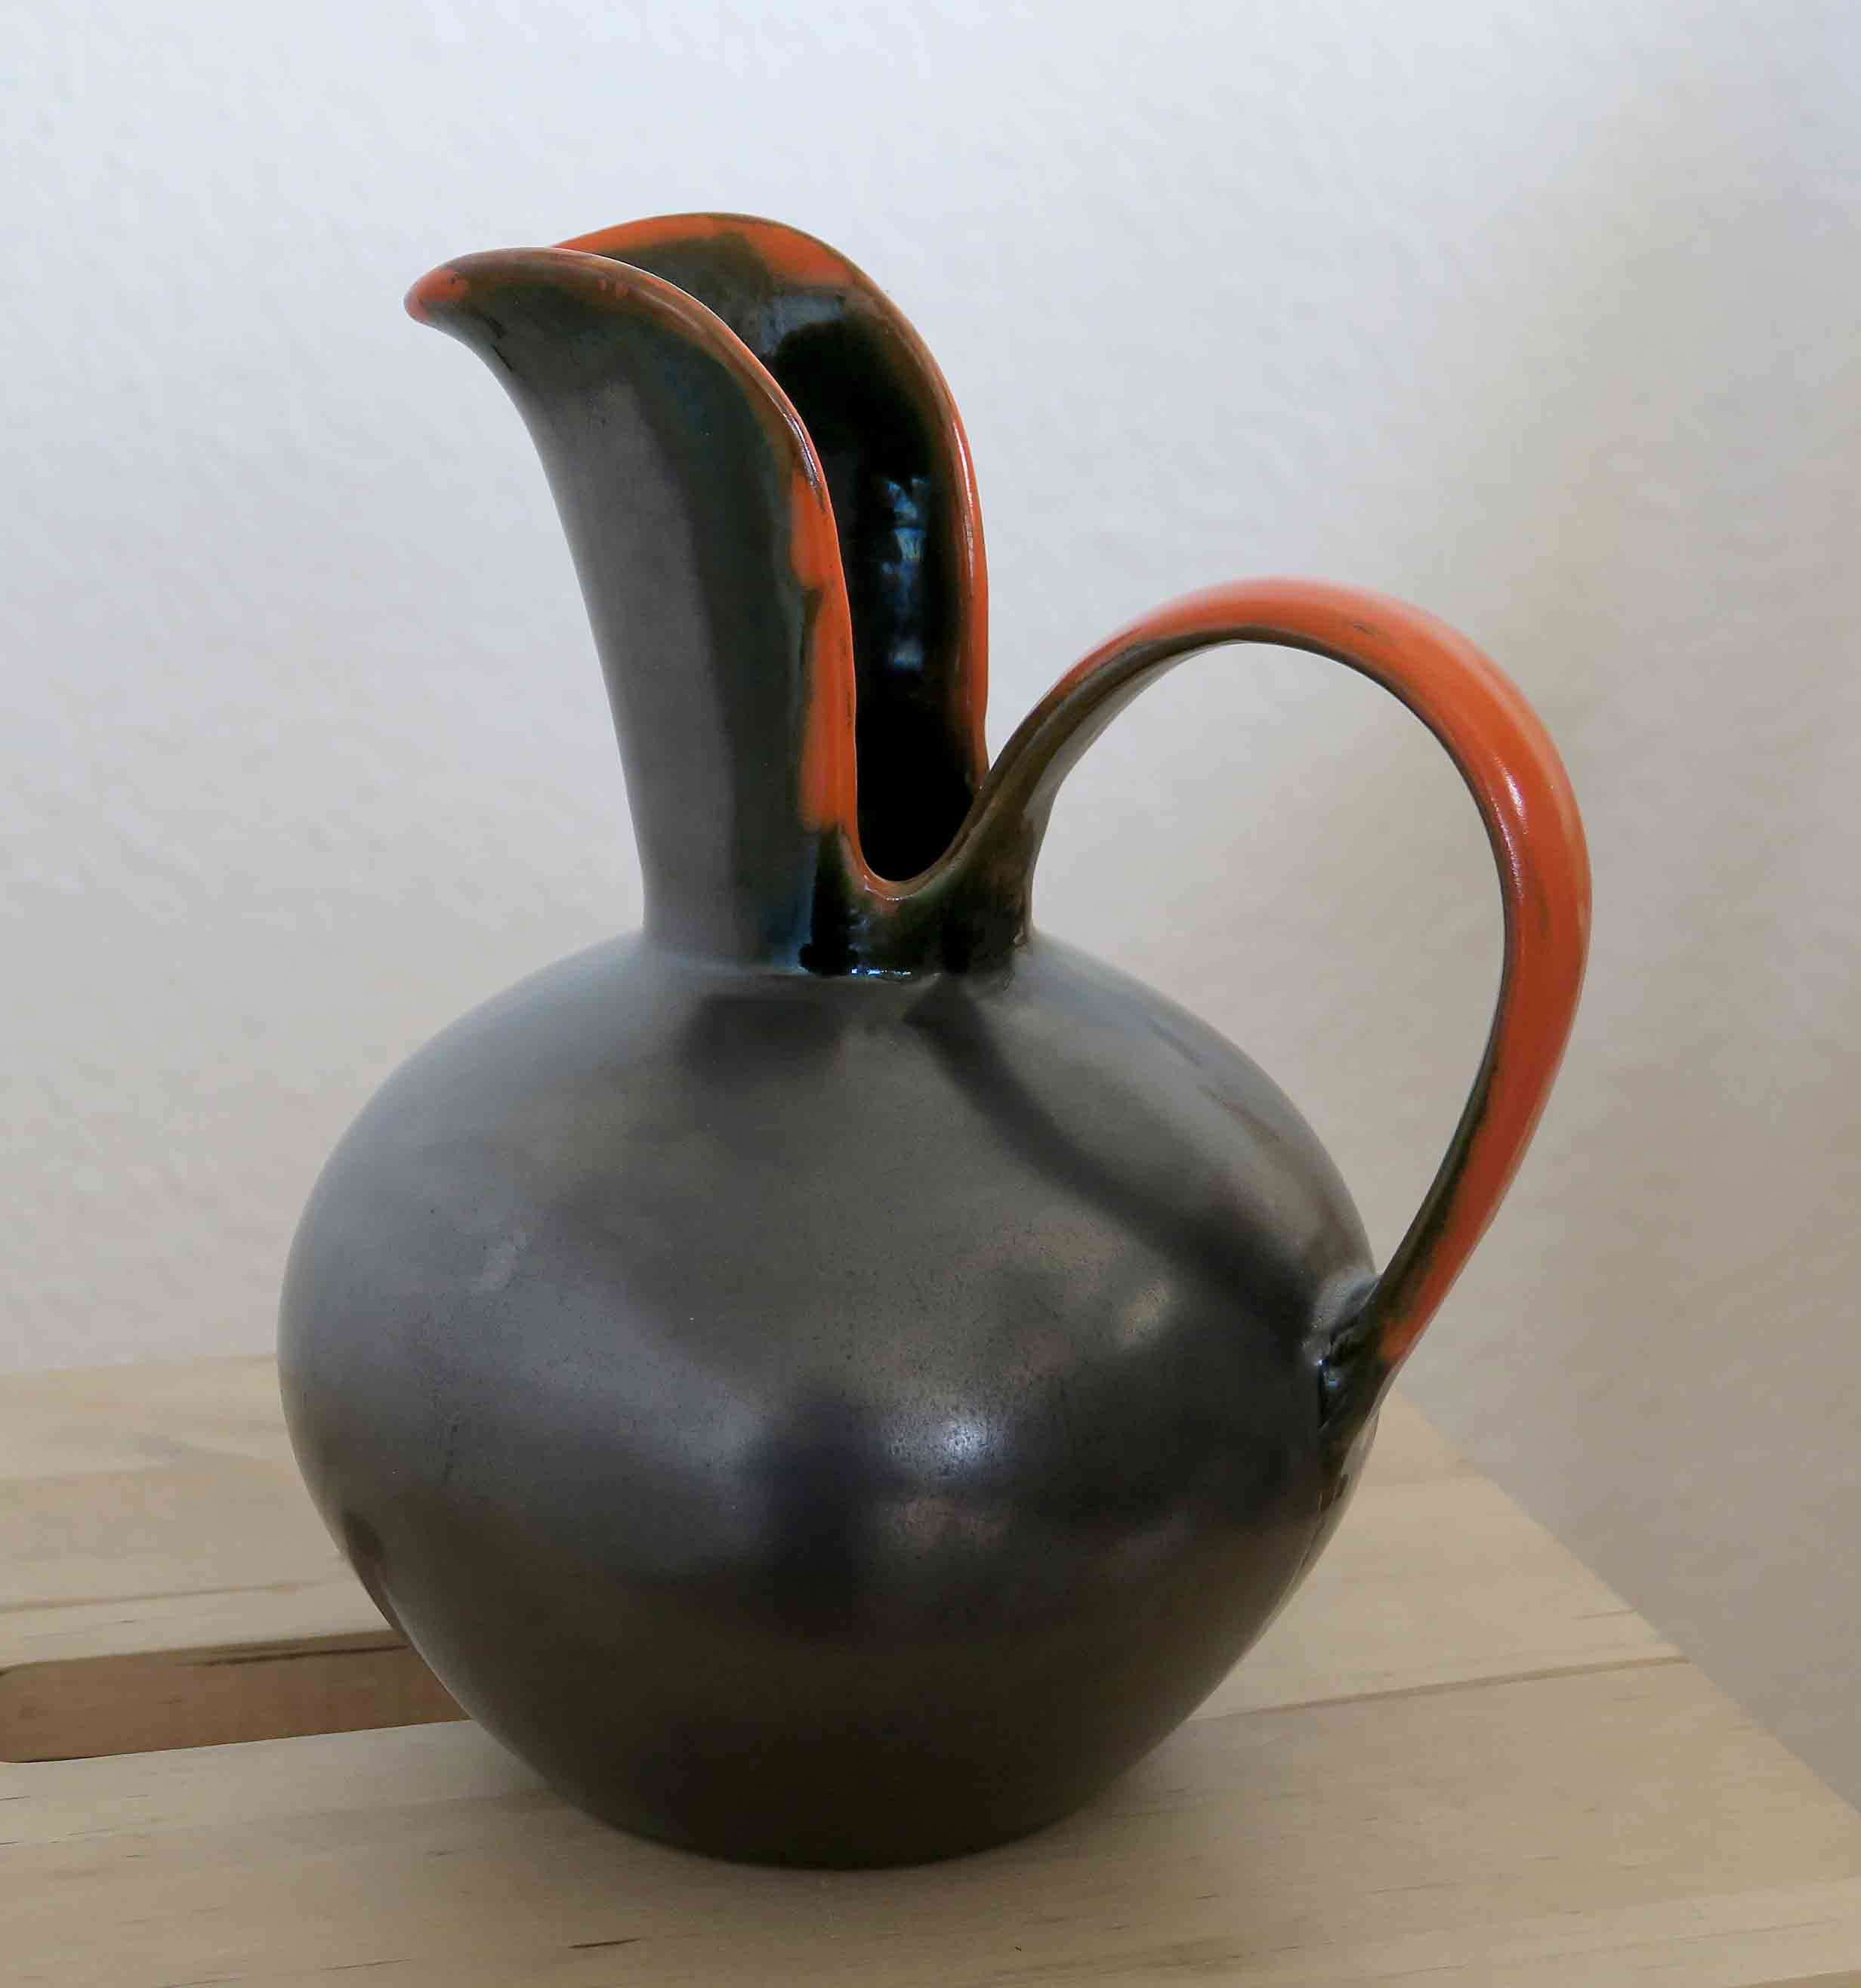 dissing keramik Mere Dissing keramik | Hold pulsen oppe! dissing keramik